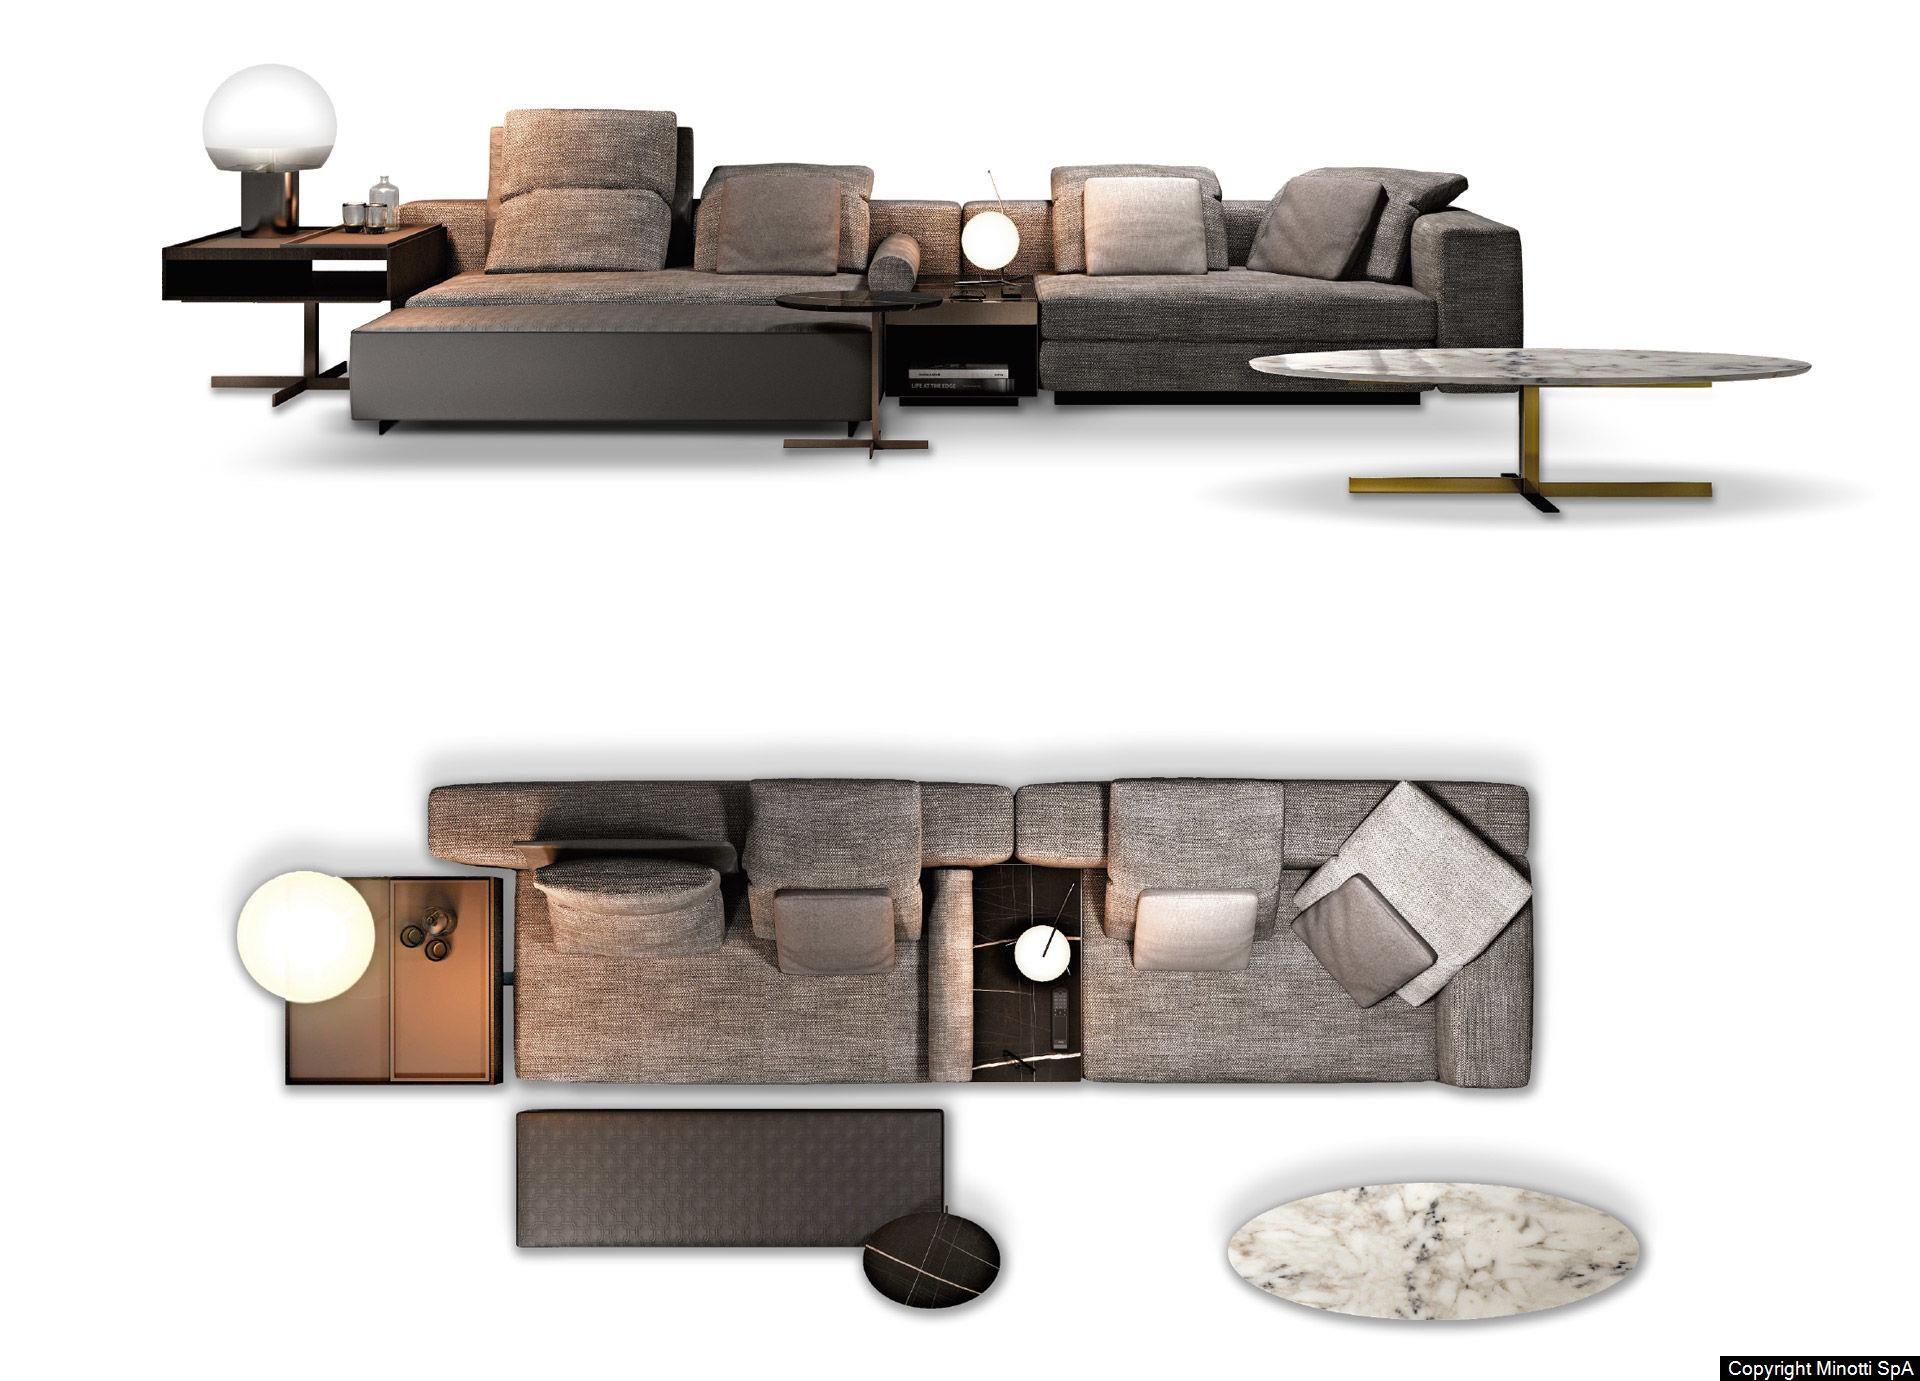 Https Www Minotti Com Es Yang 2 Elegant Living Room Decor Minotti Furniture Sofa Layout View modern home decor living room png